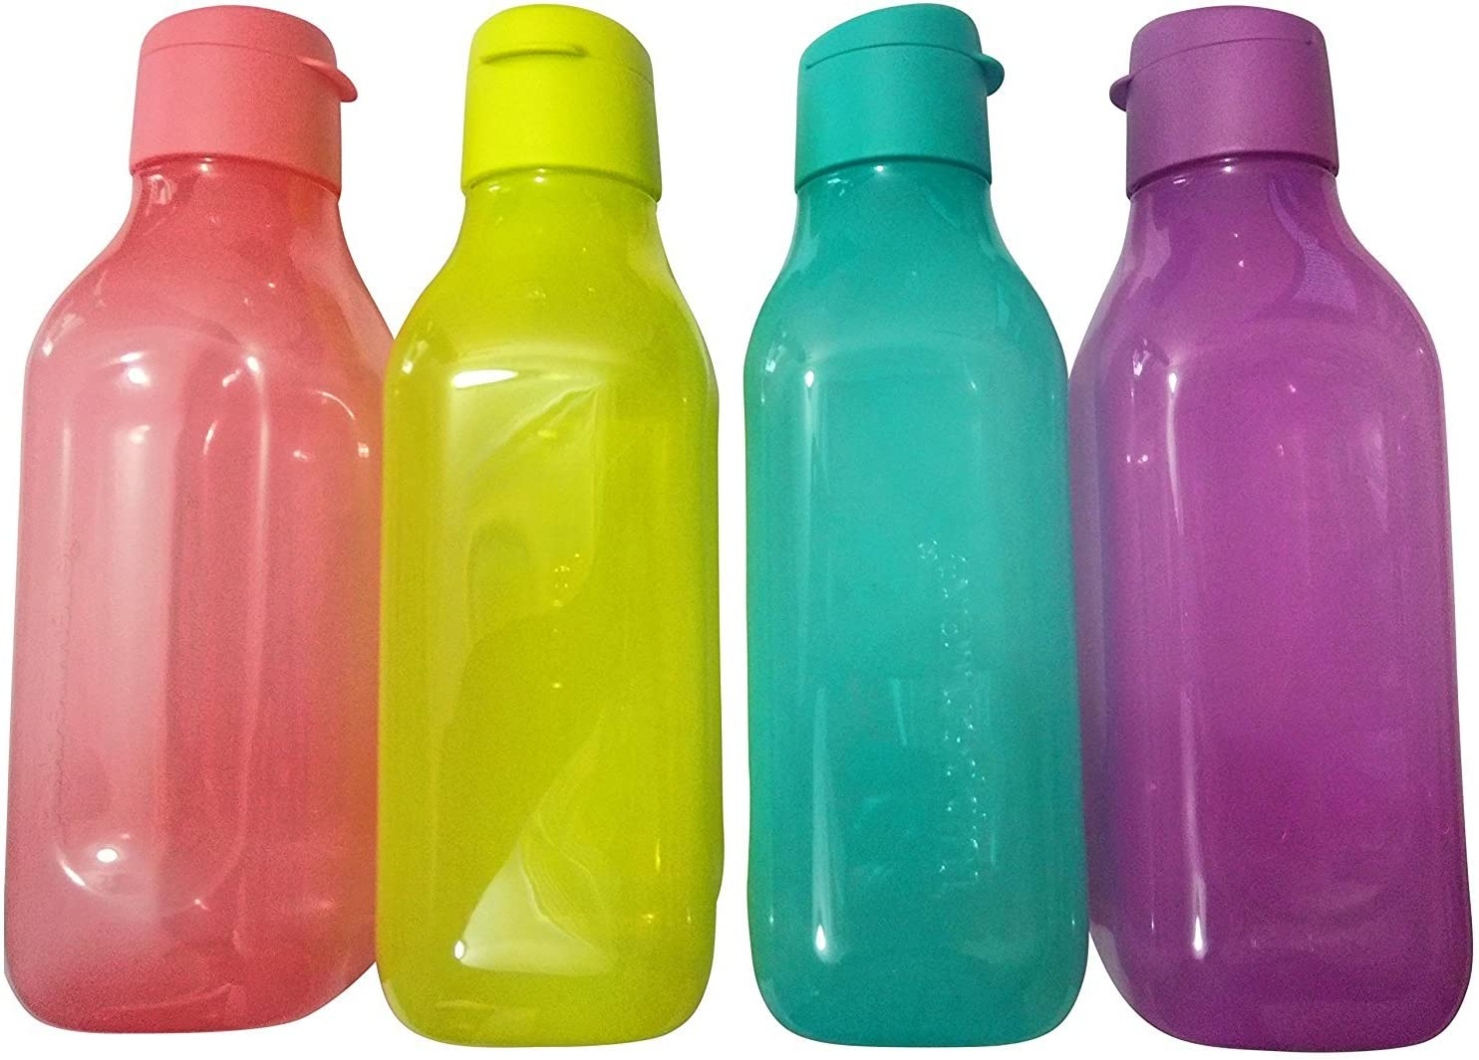 Tupperware Aquasafe Square Fliptop Water Bottle - 1 Litre, Set of 4,